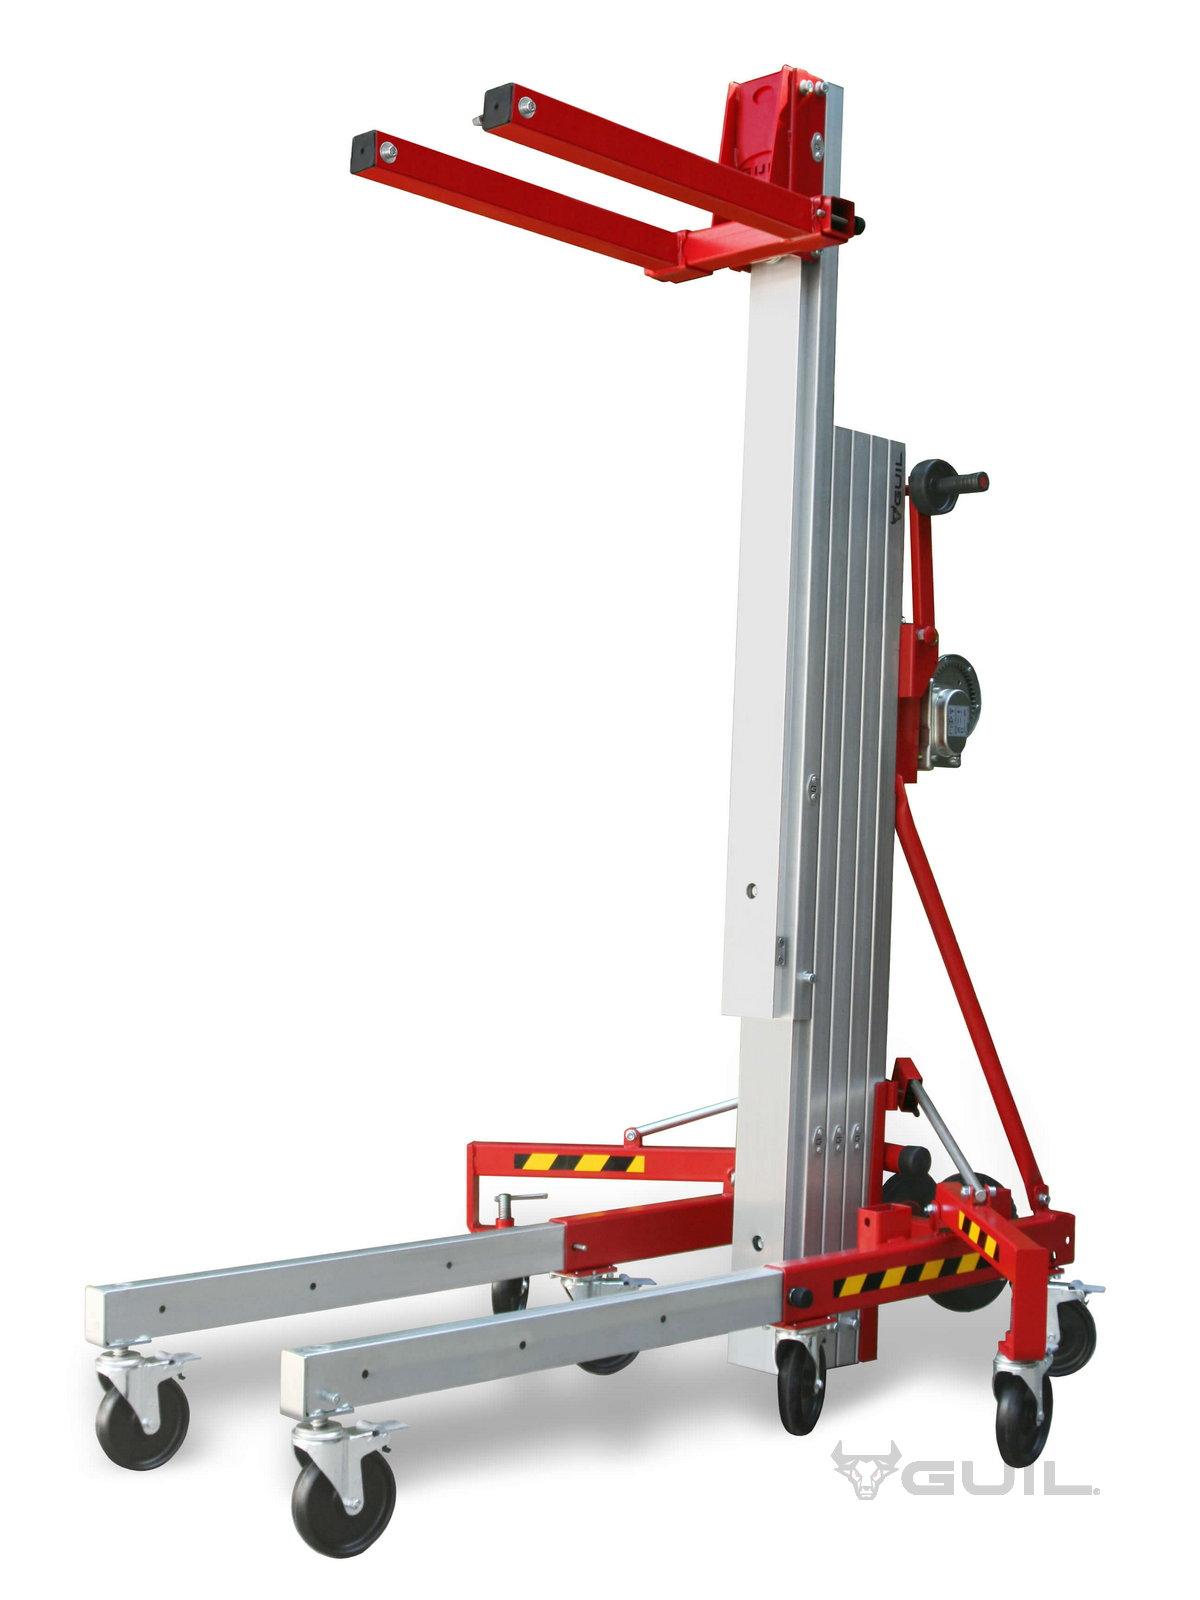 Kanaallift 6,30 m 220 kg (dutch) (1)